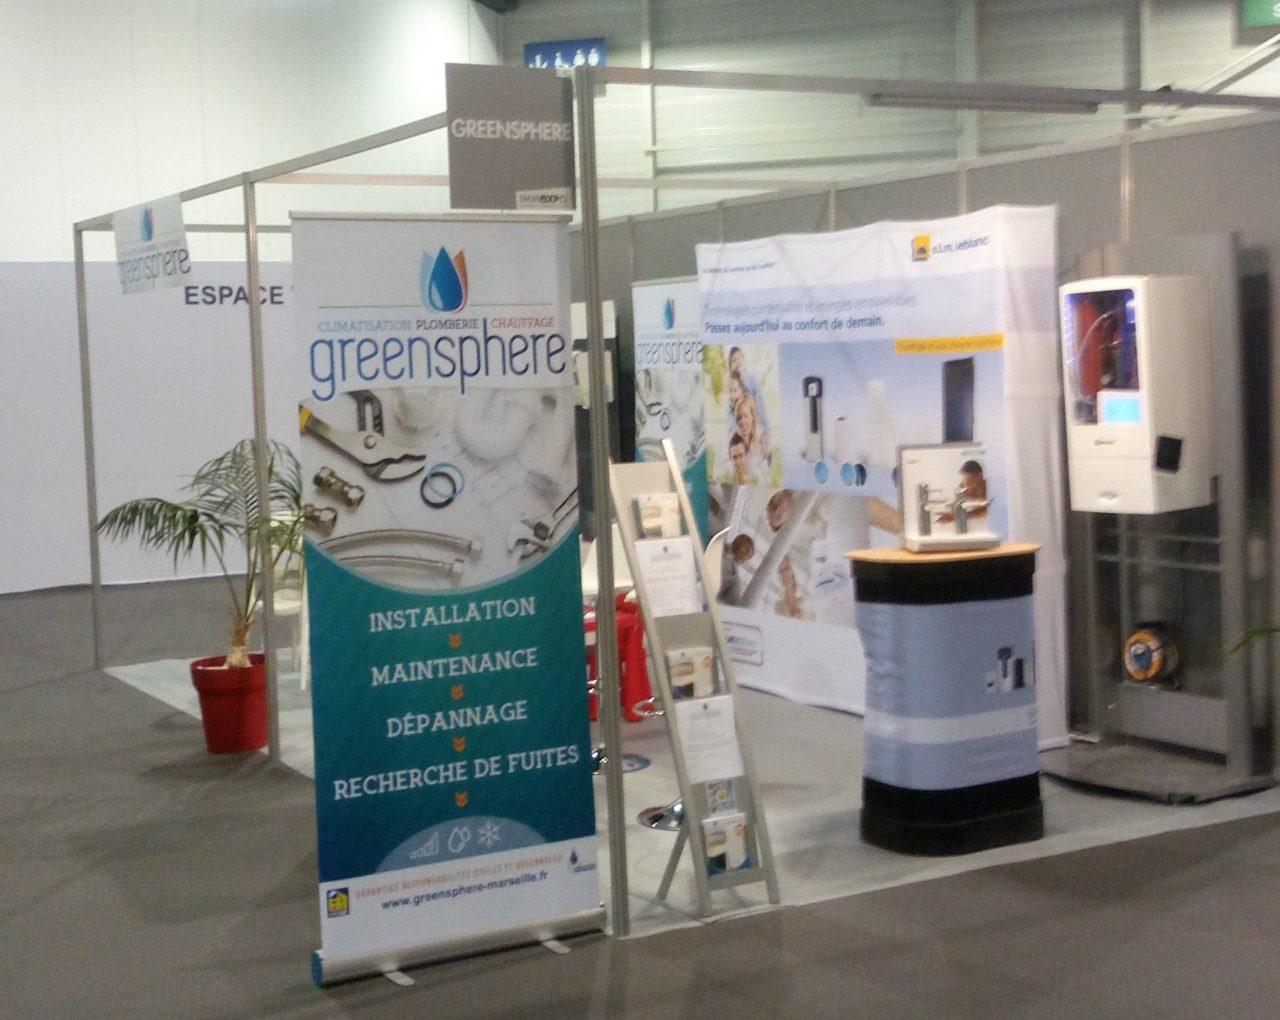 https://www.greensphere-marseille.fr/wp-content/uploads/2017/03/Salon-de-limmobilier-Marseille-1280x1020.jpg